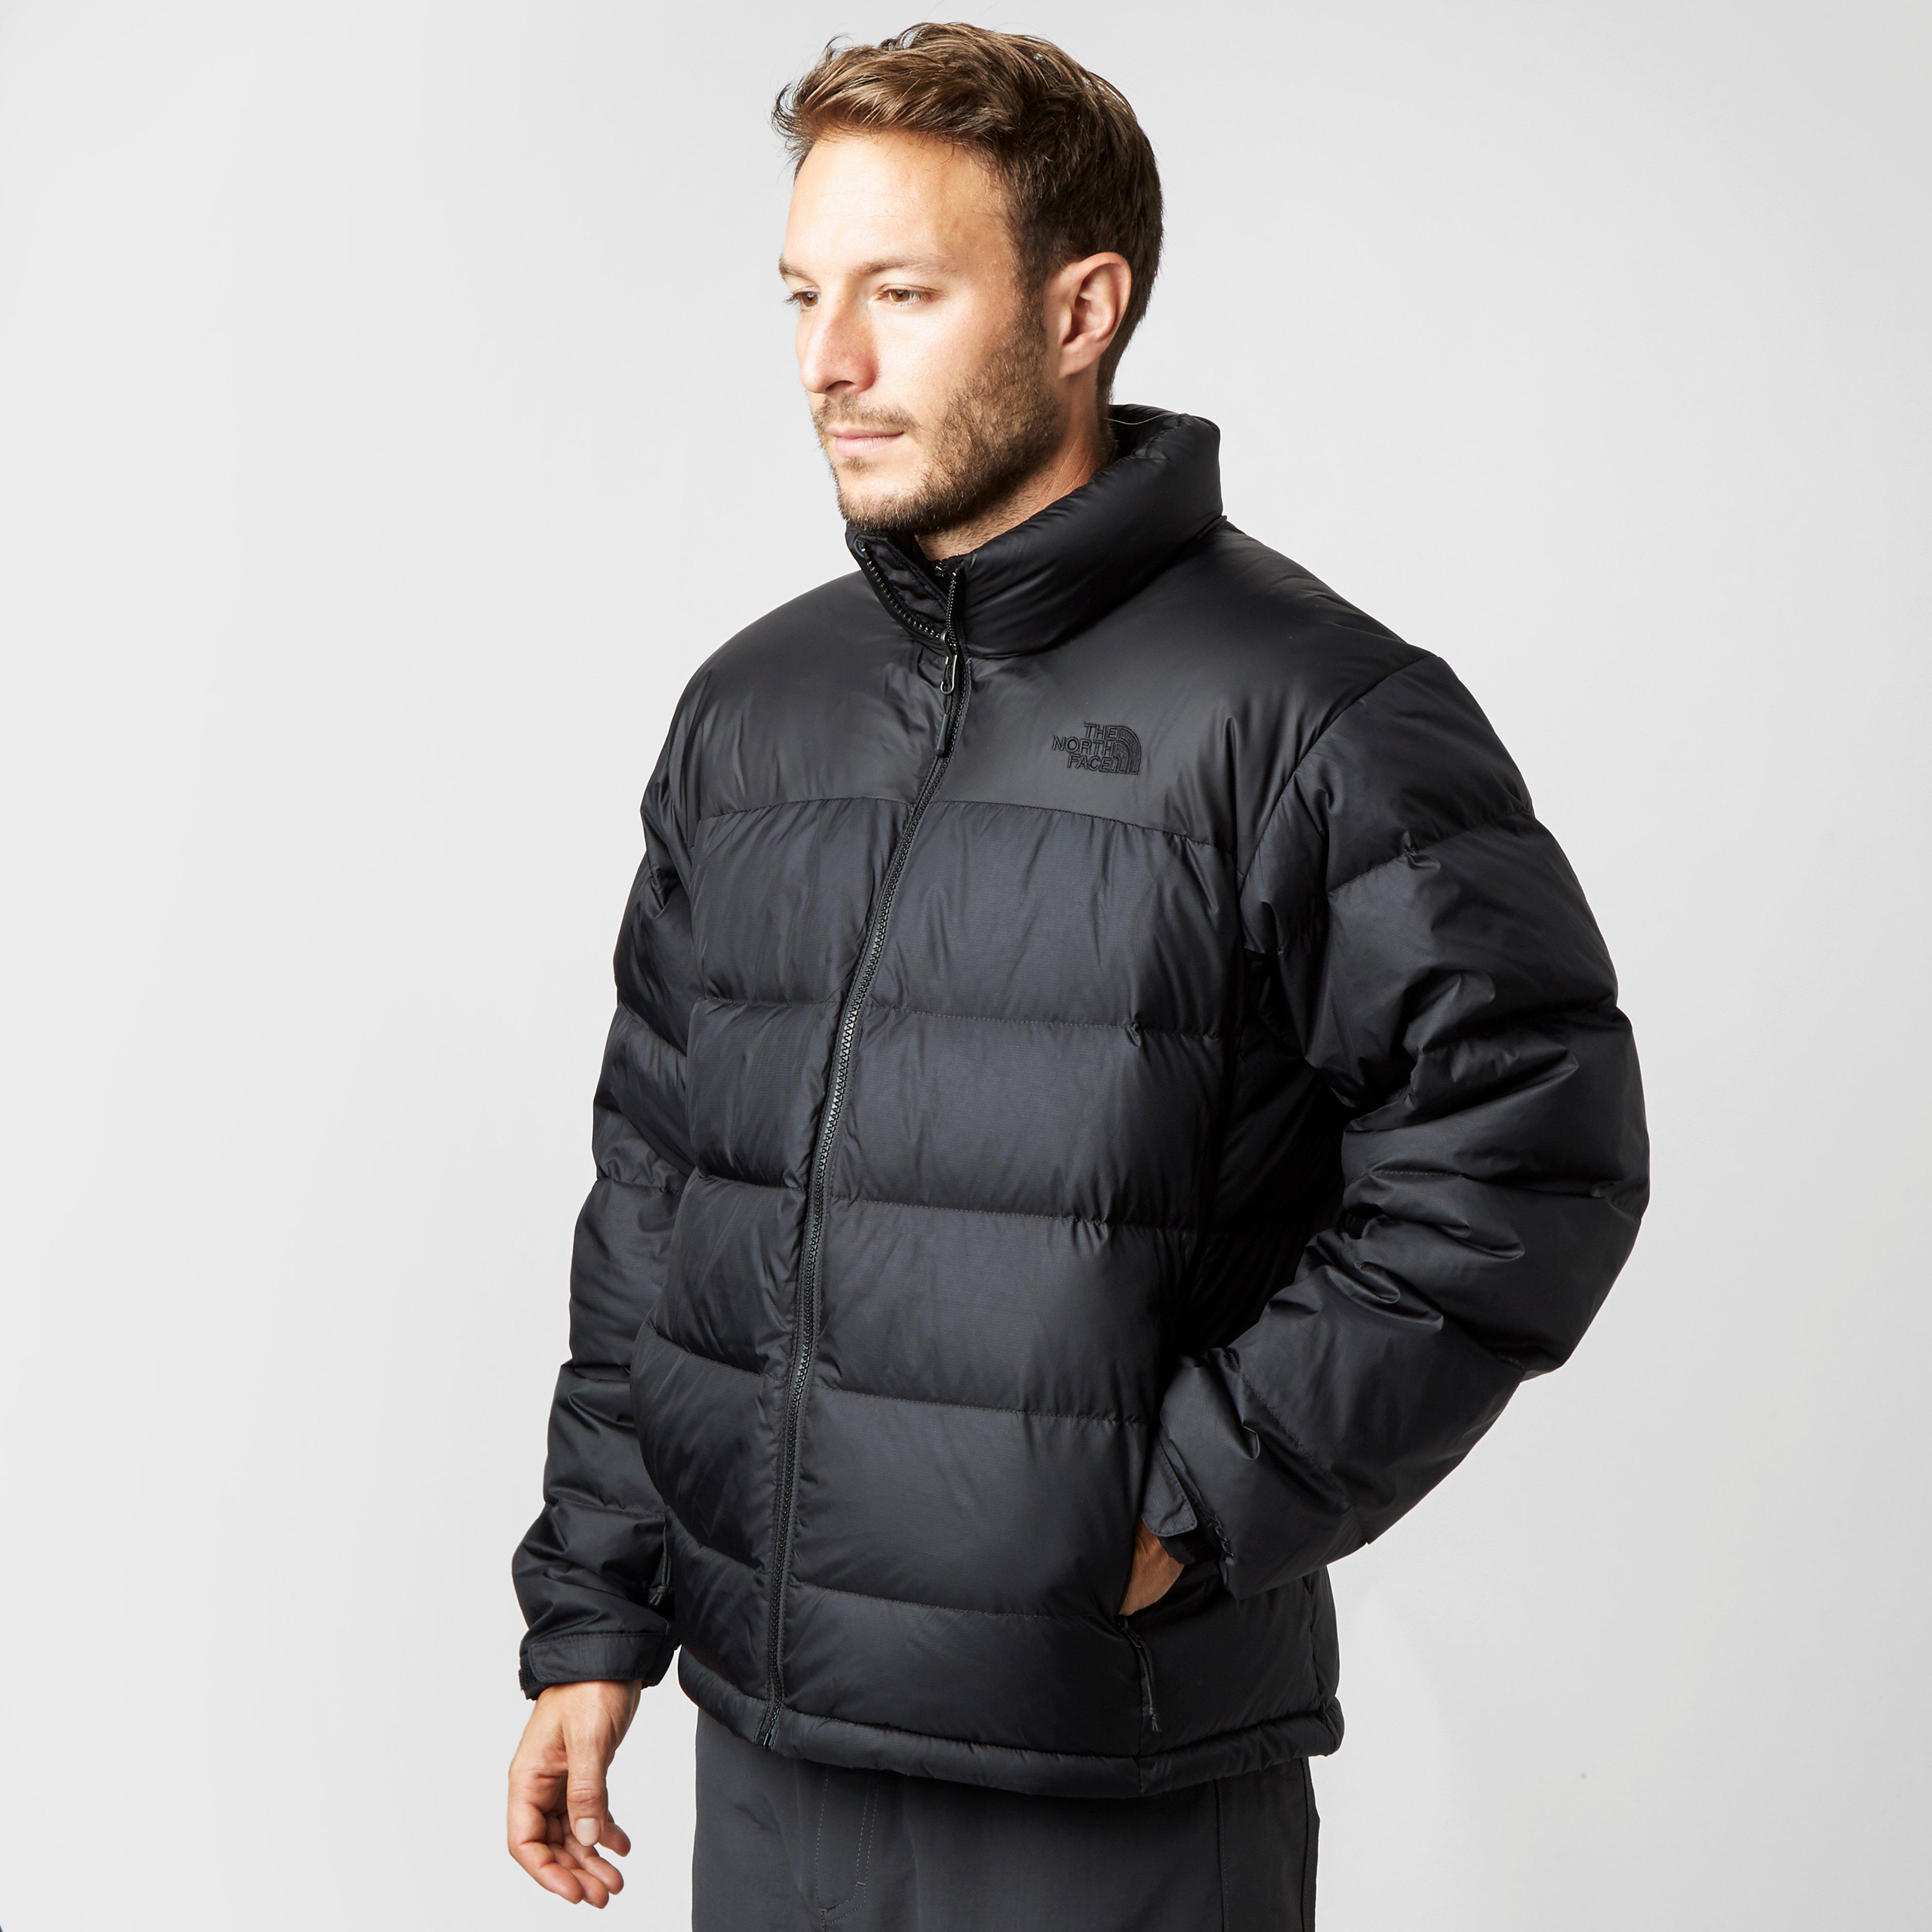 north face coats mens sale - Marwood VeneerMarwood Veneer 026a95b48